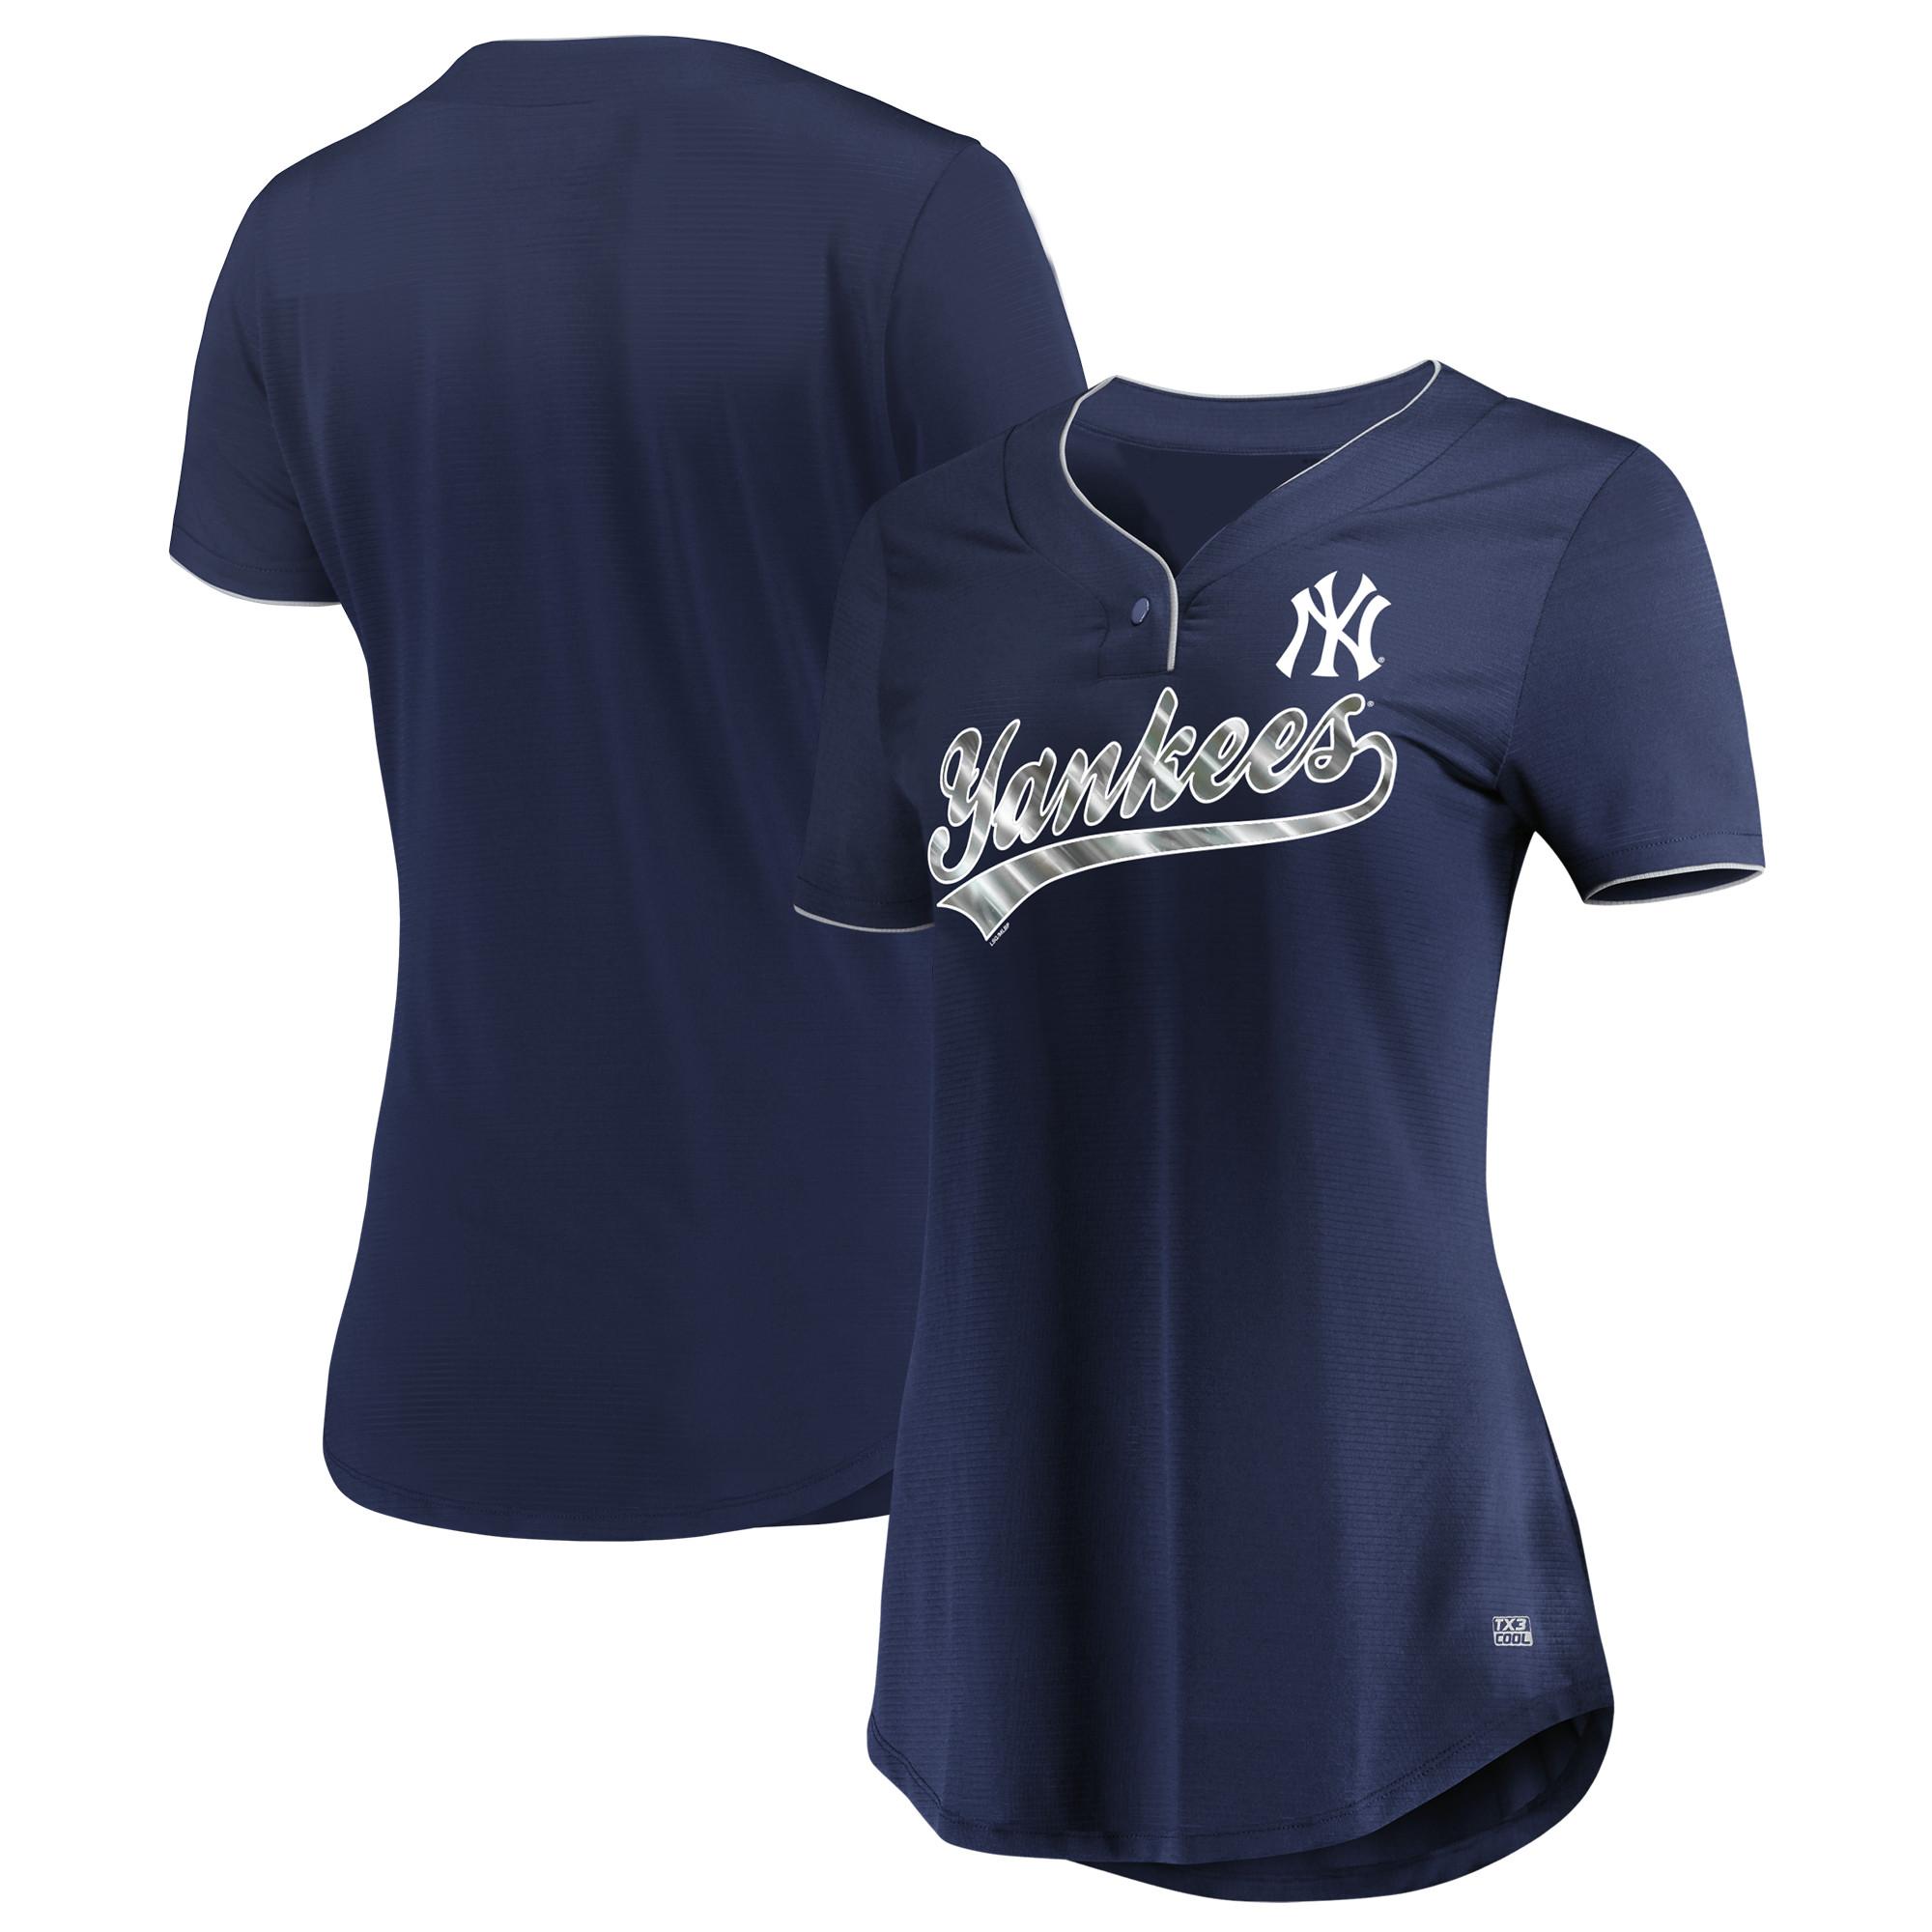 Women's Majestic Navy New York Yankees Memorable Season TX3 Cool Fabric V-Neck T-Shirt